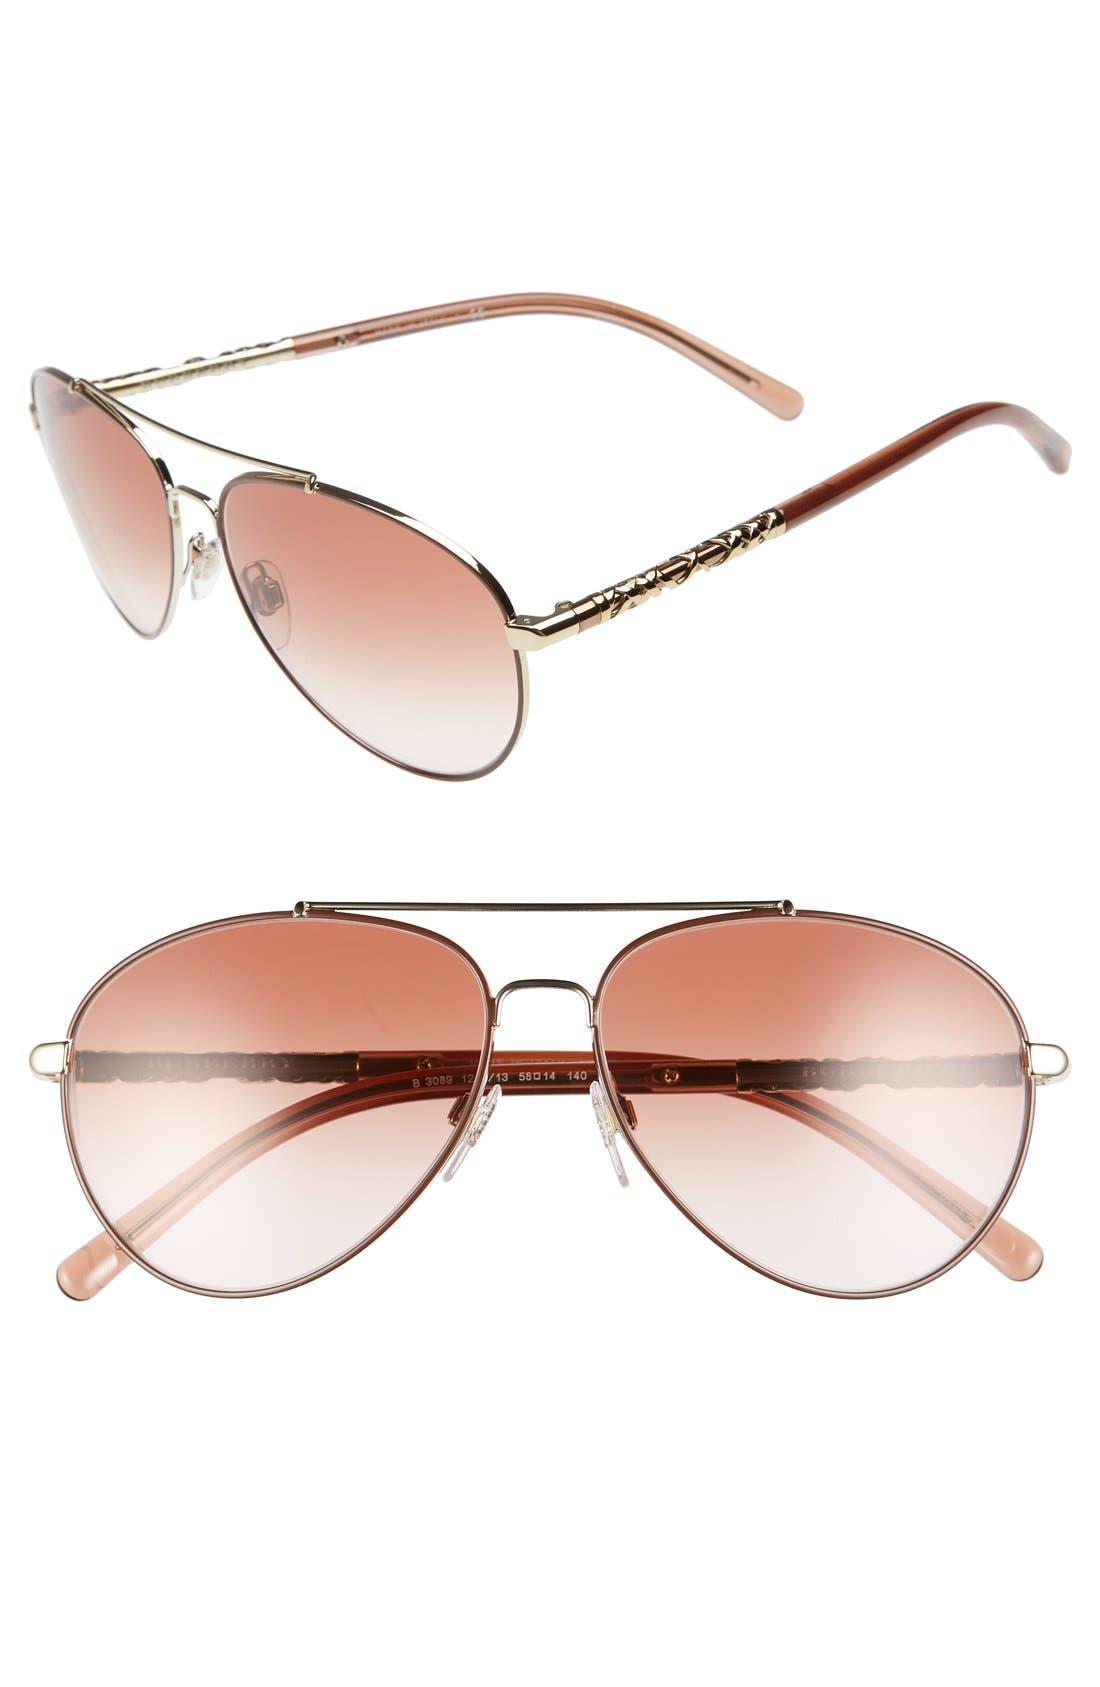 58mm Aviator Sunglasses,                         Main,                         color, Pink Gradient